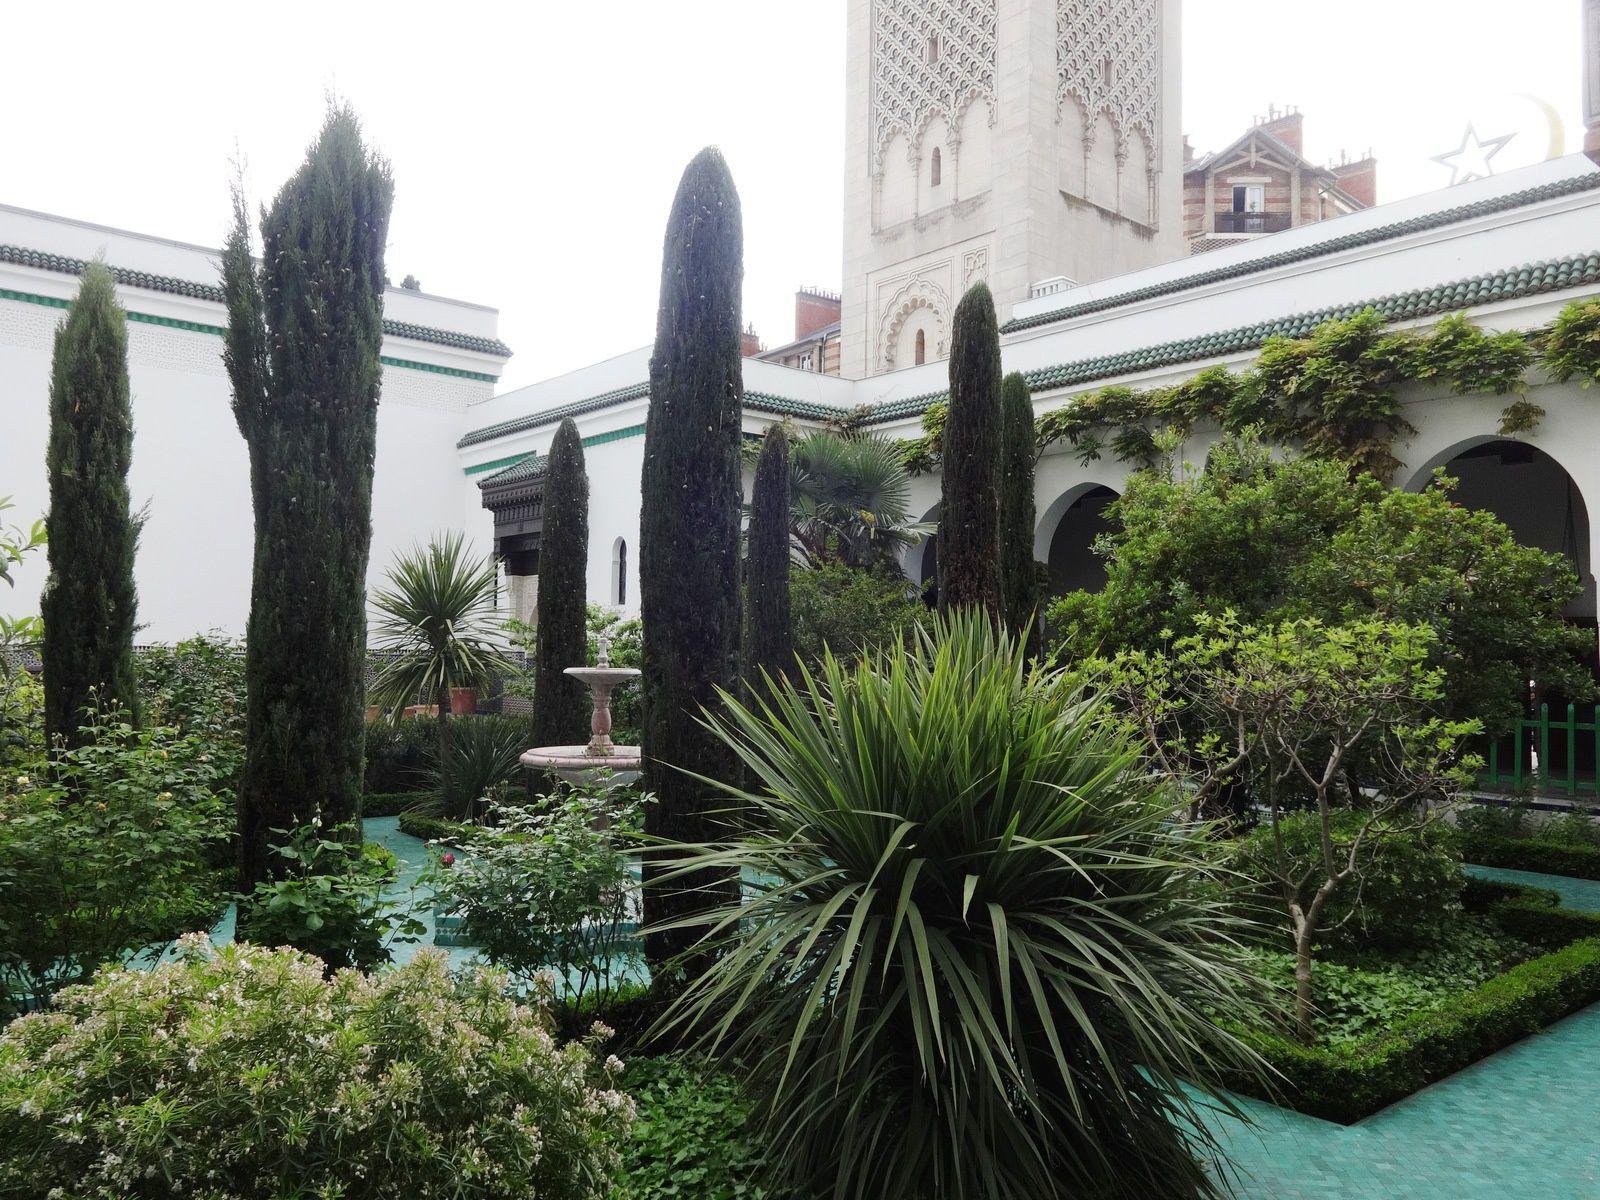 Les jardins luxuriants de la Grande Mosquée